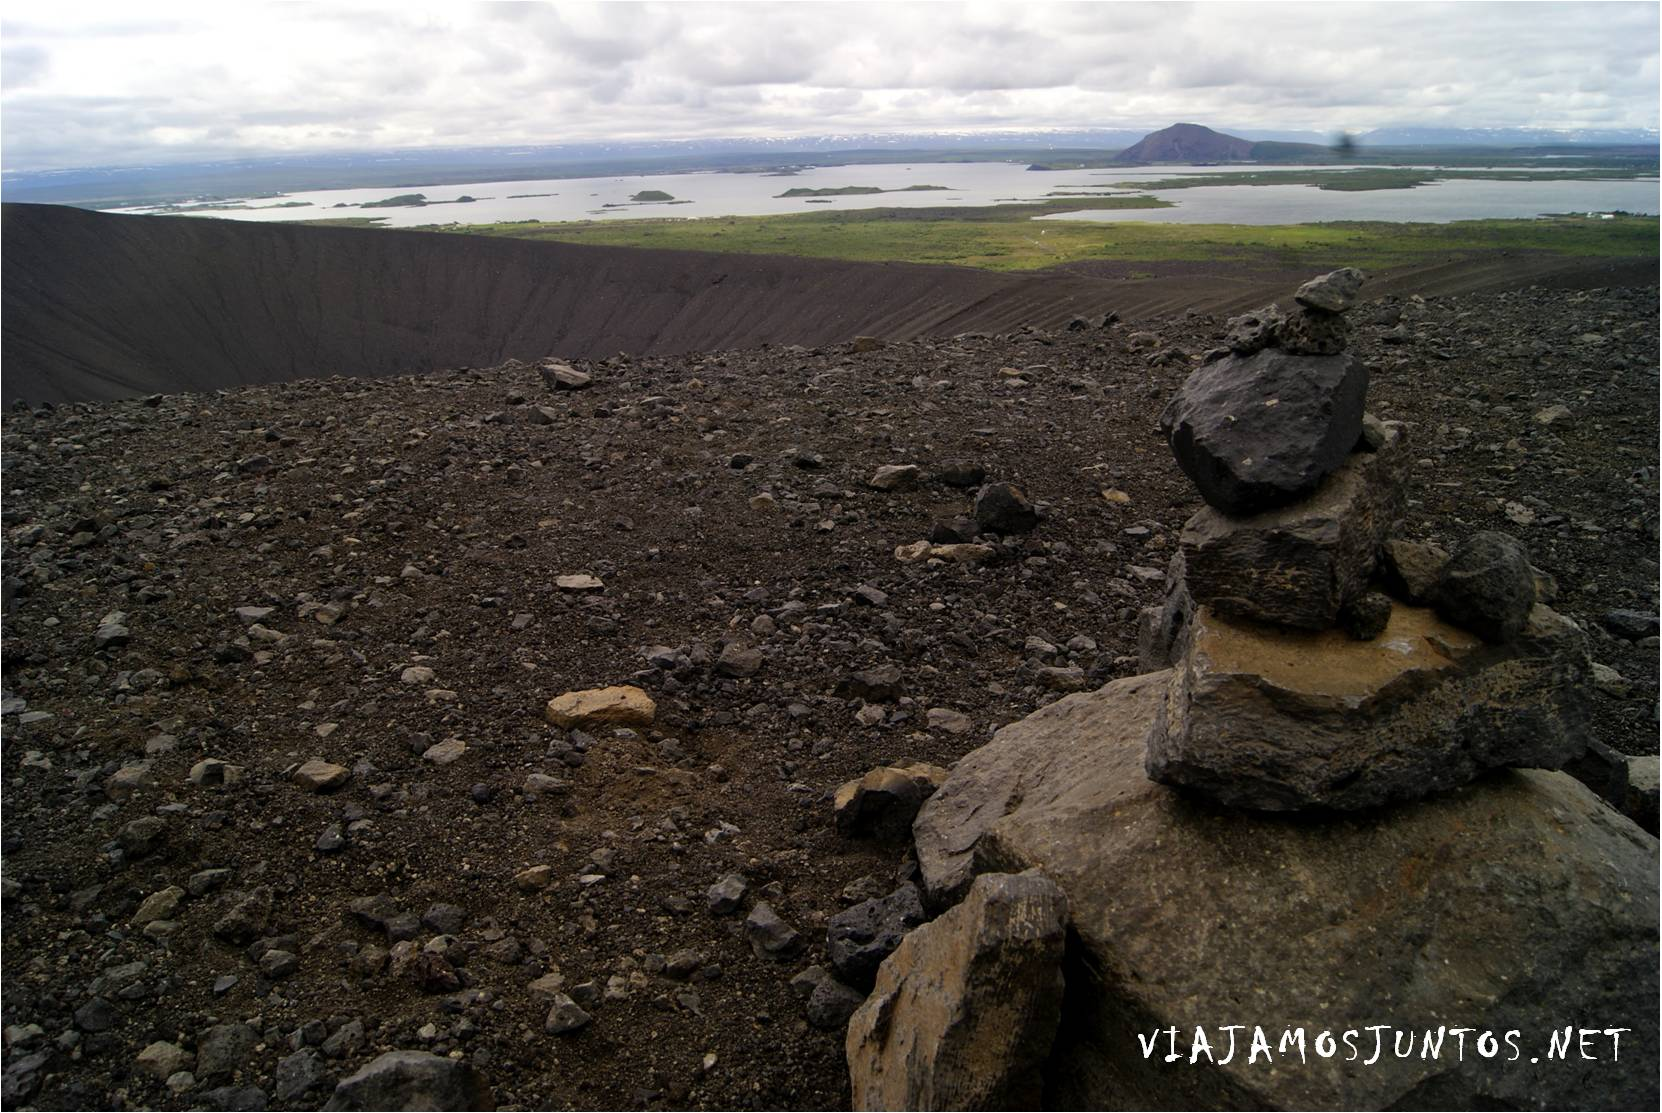 Hverfjall, cráter negro, Myvatn, Cráteres falsos, Stakholstjorn, Skutustadir, pseudo cráteres, crateres, volcanes, Islandia, Iceland, rutas, curiosidades